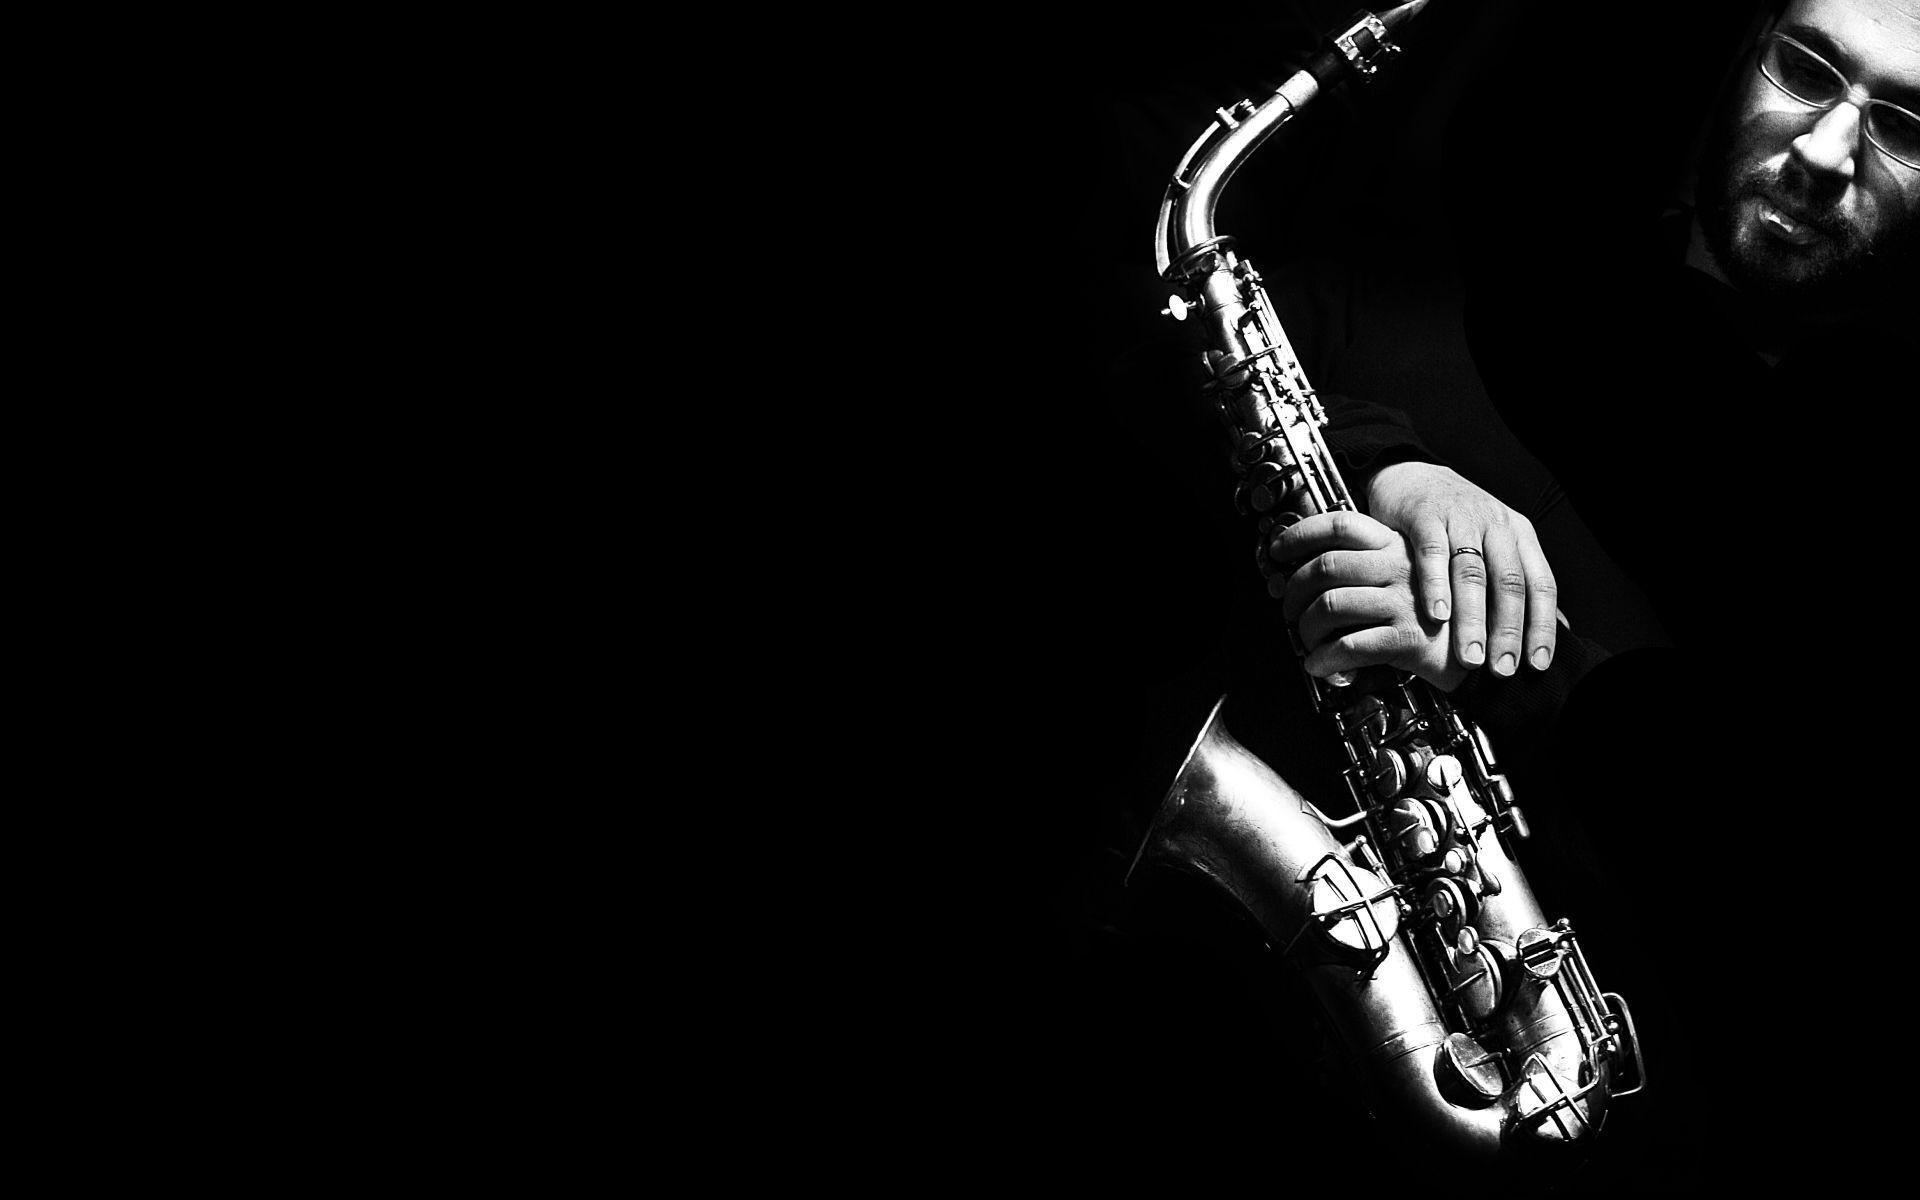 Saxophone Wallpaper Hd For Desktop Wallpaper 1920 x 1200 px 692.31 KB  saxophone hd widescreen jazz